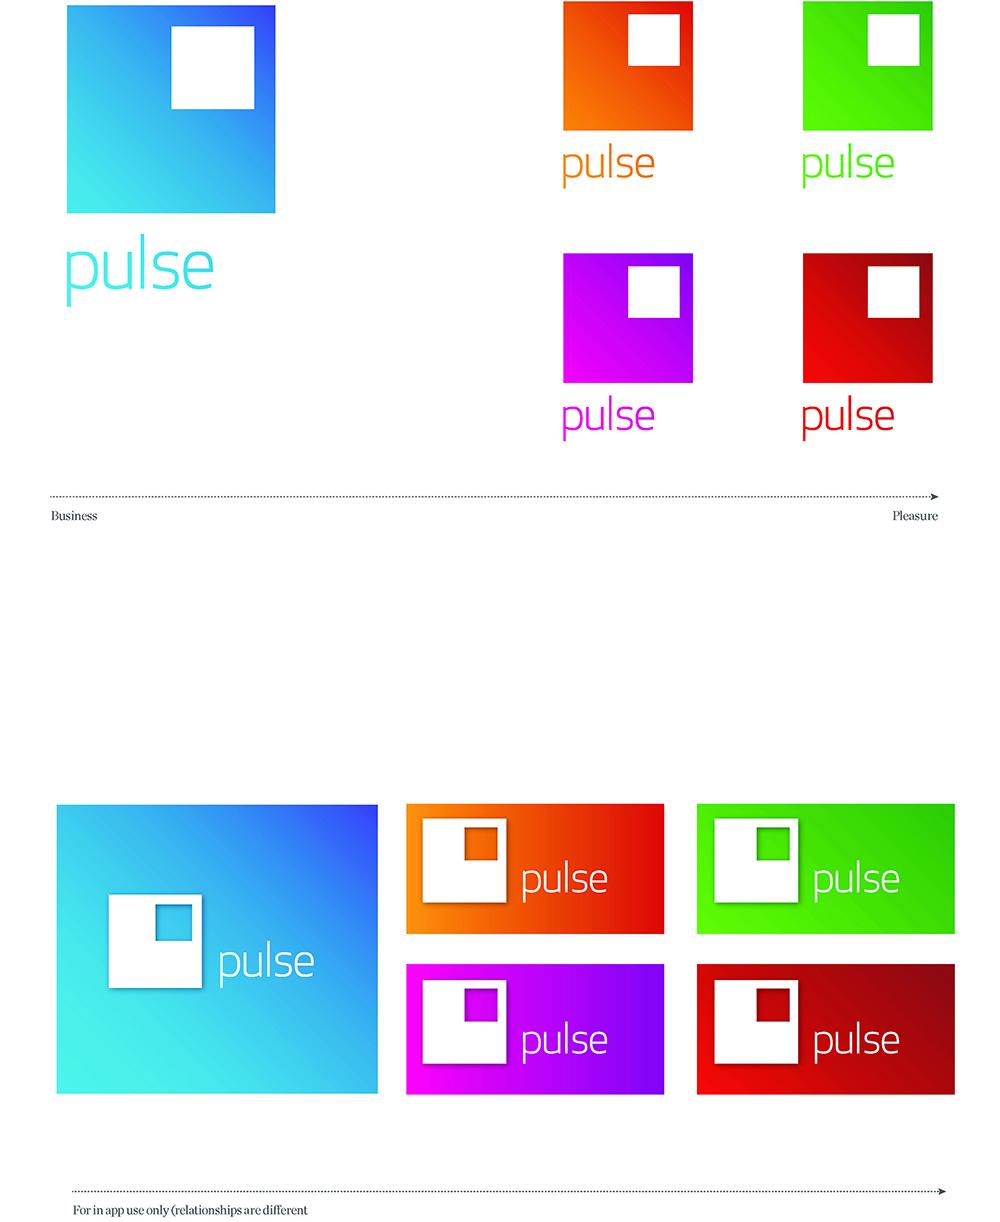 Pulse_1B.jpg